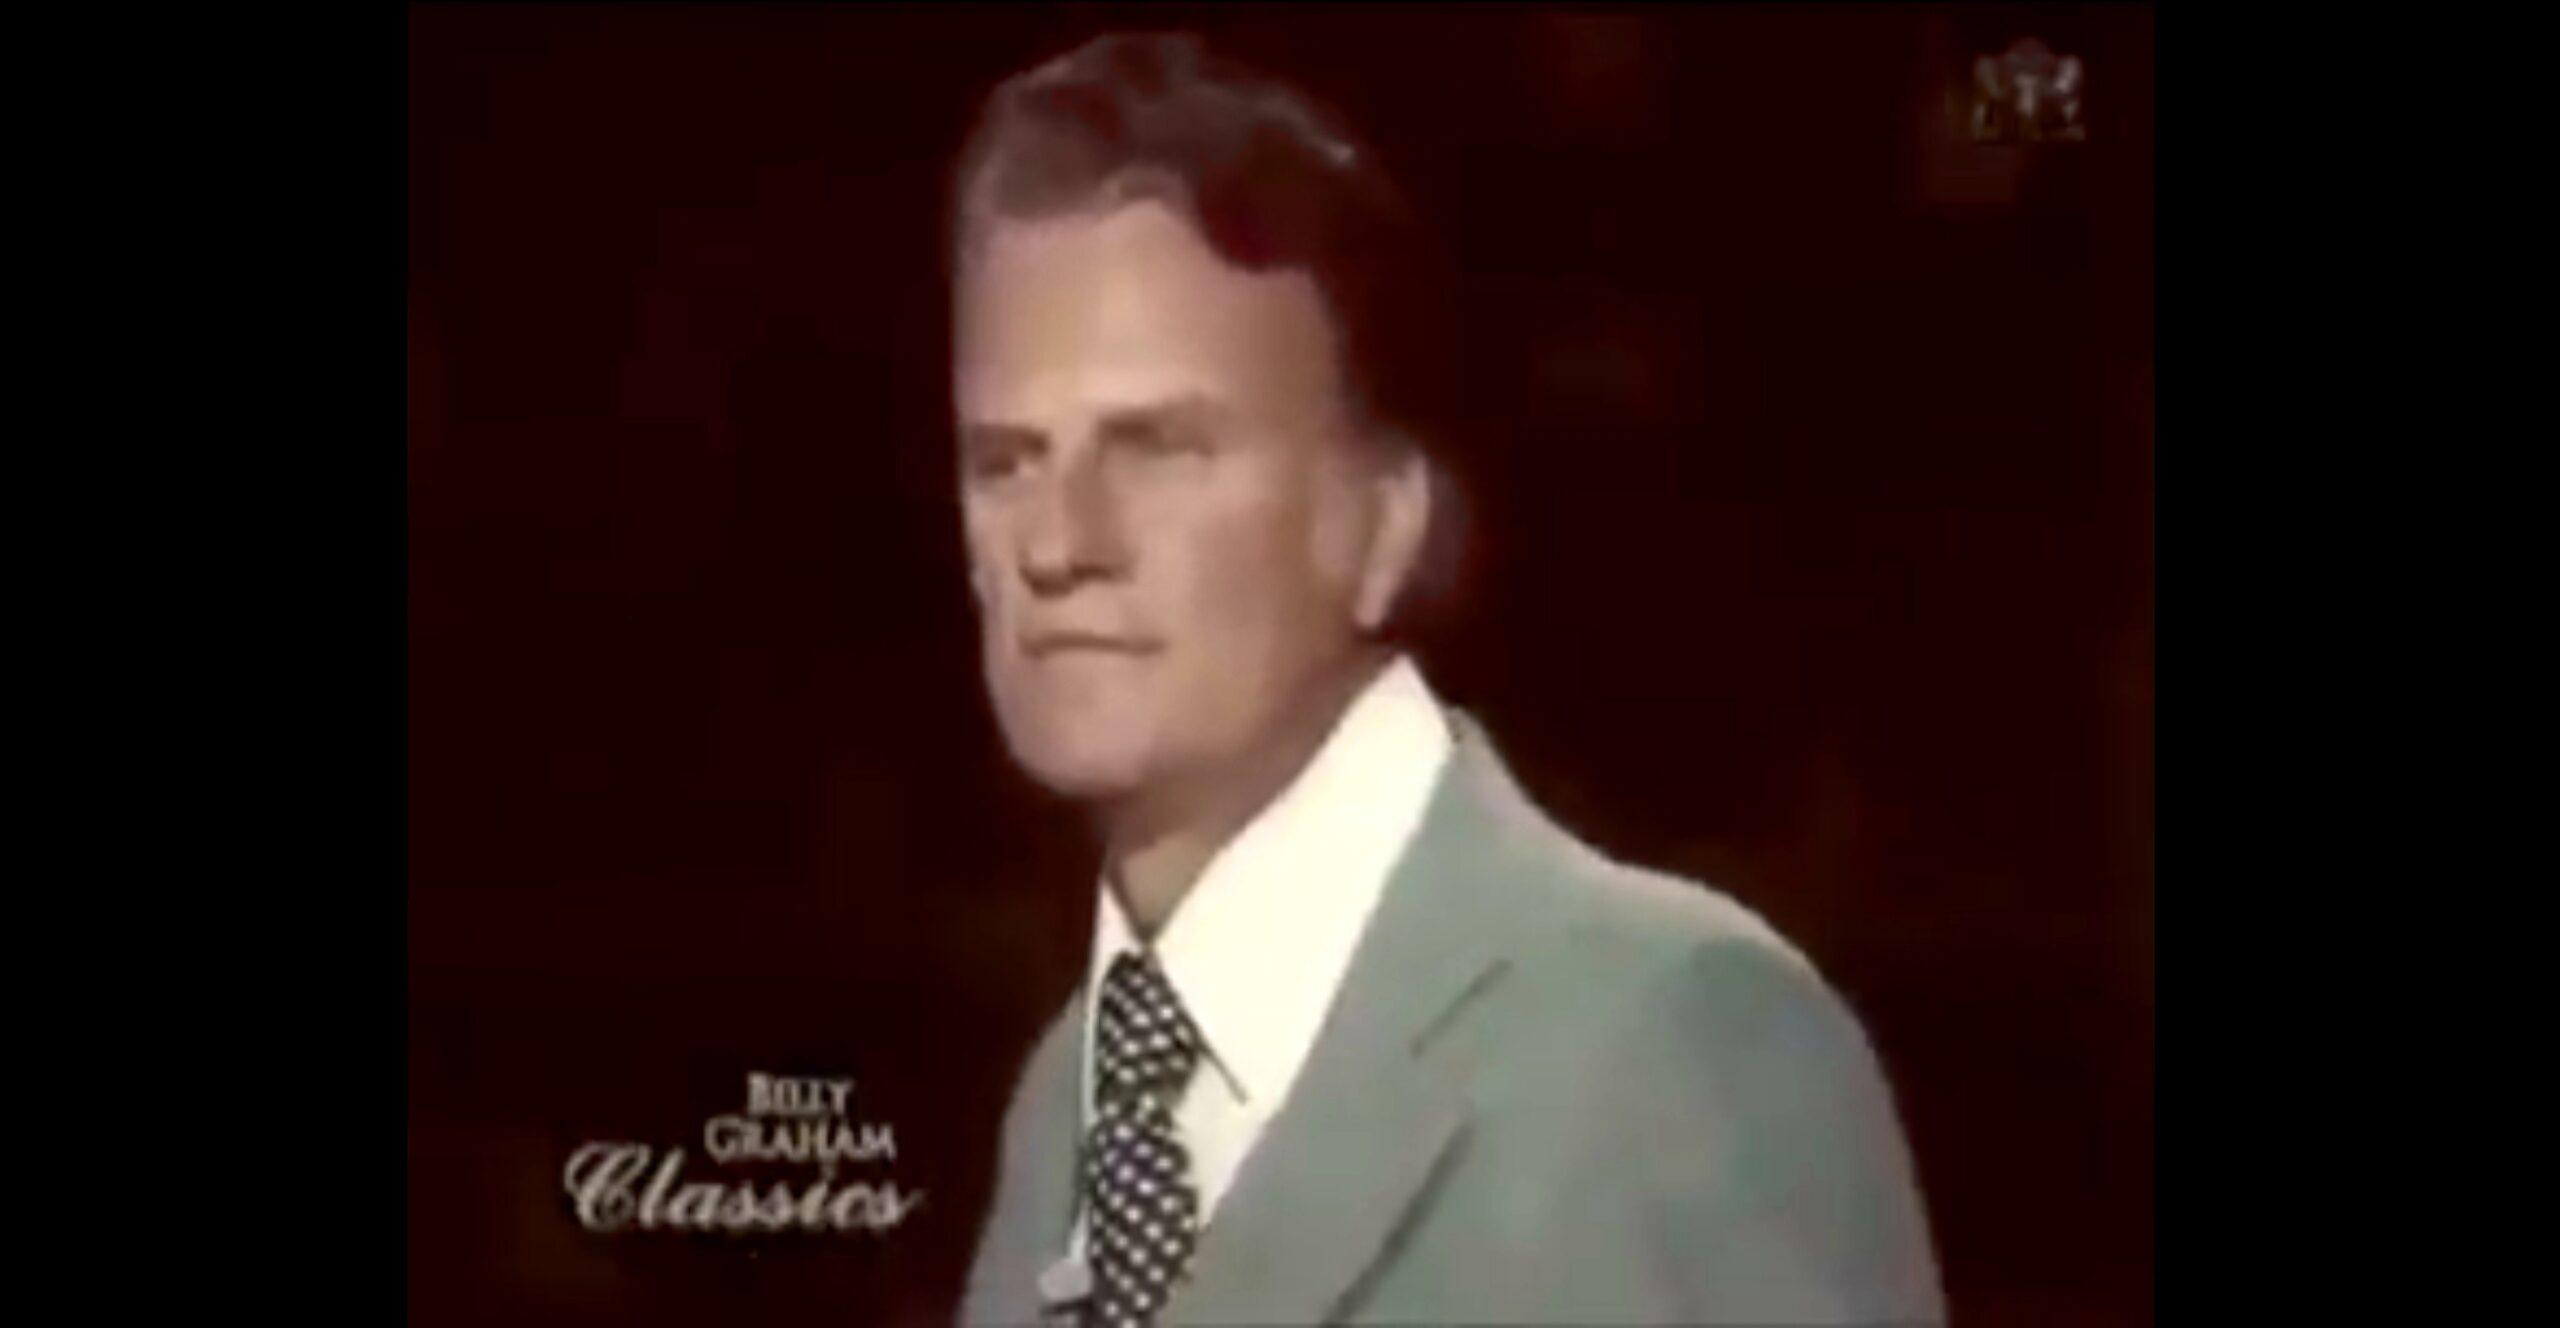 Billy Graham: Bůh koná své dílo!